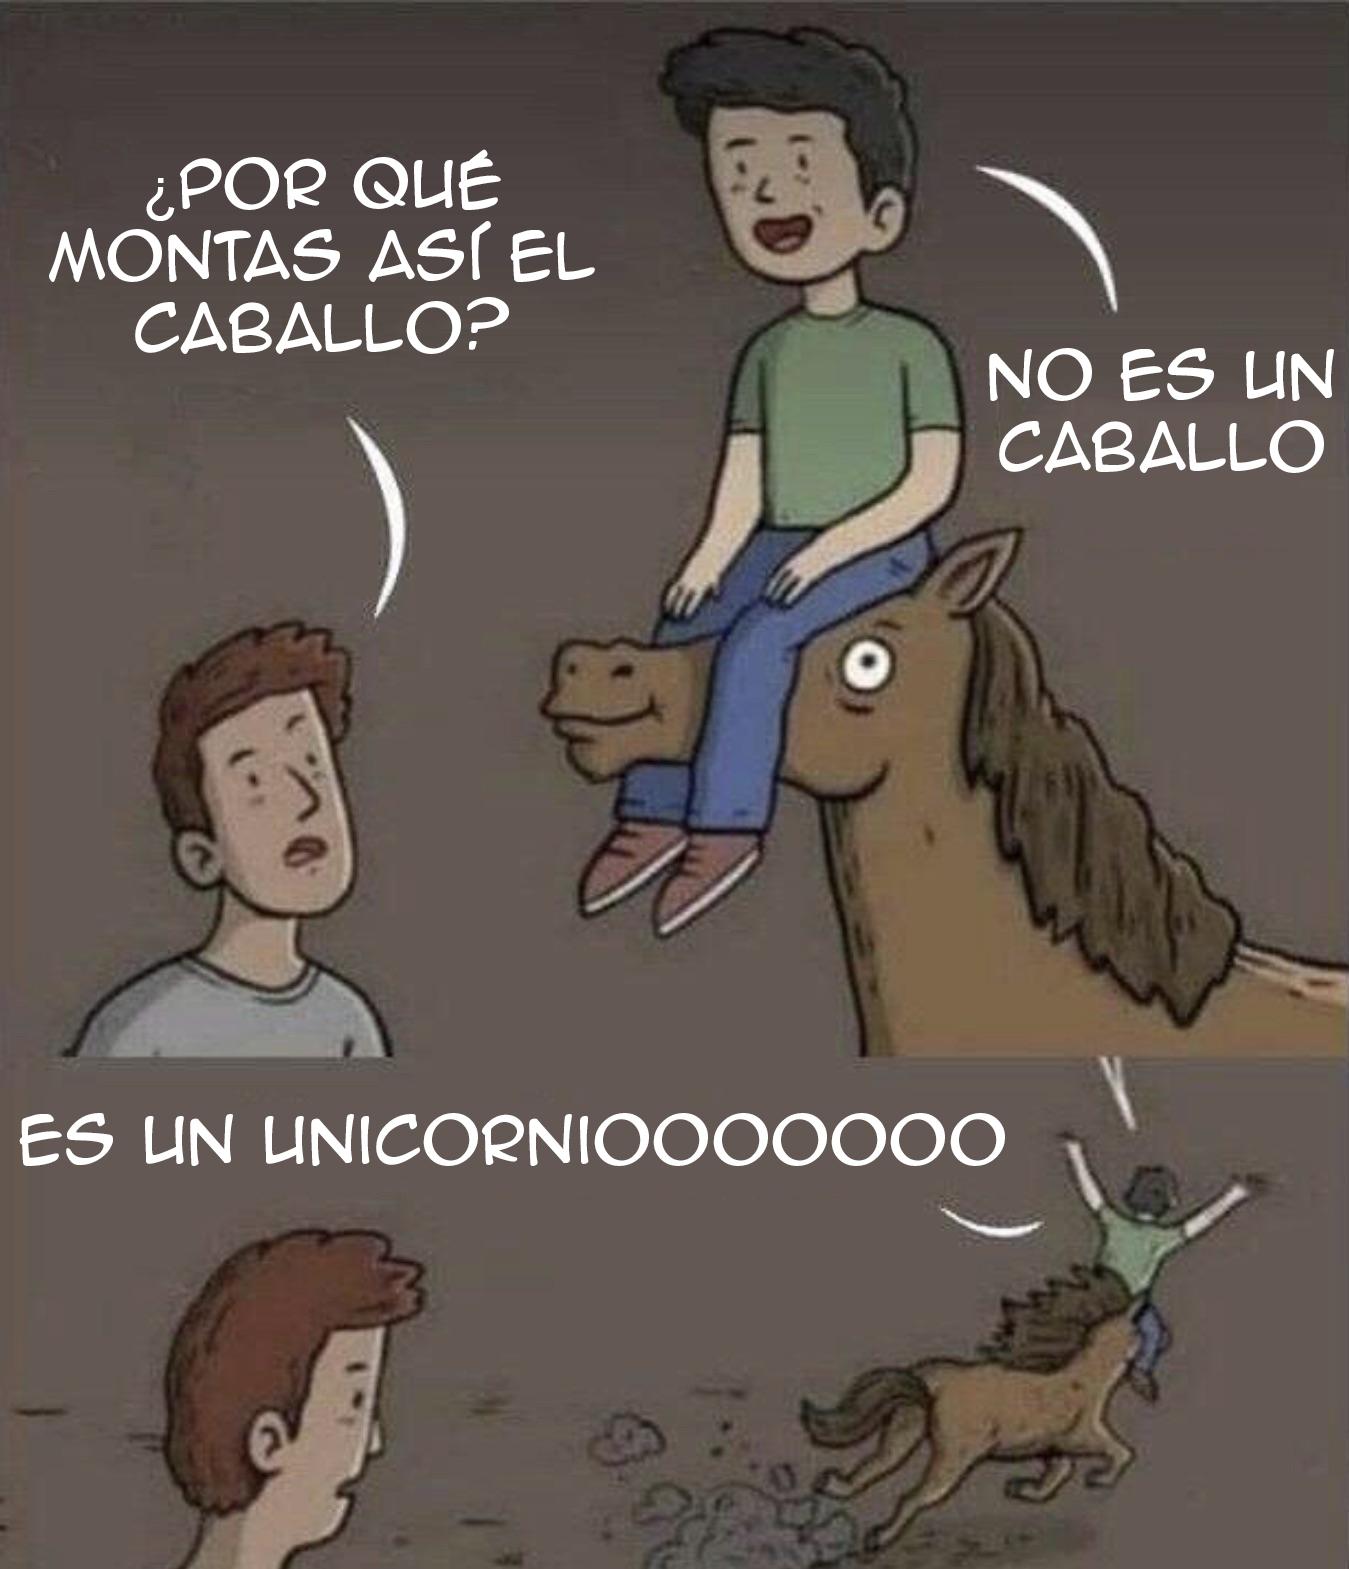 ¿Por qué montas así en caballo?